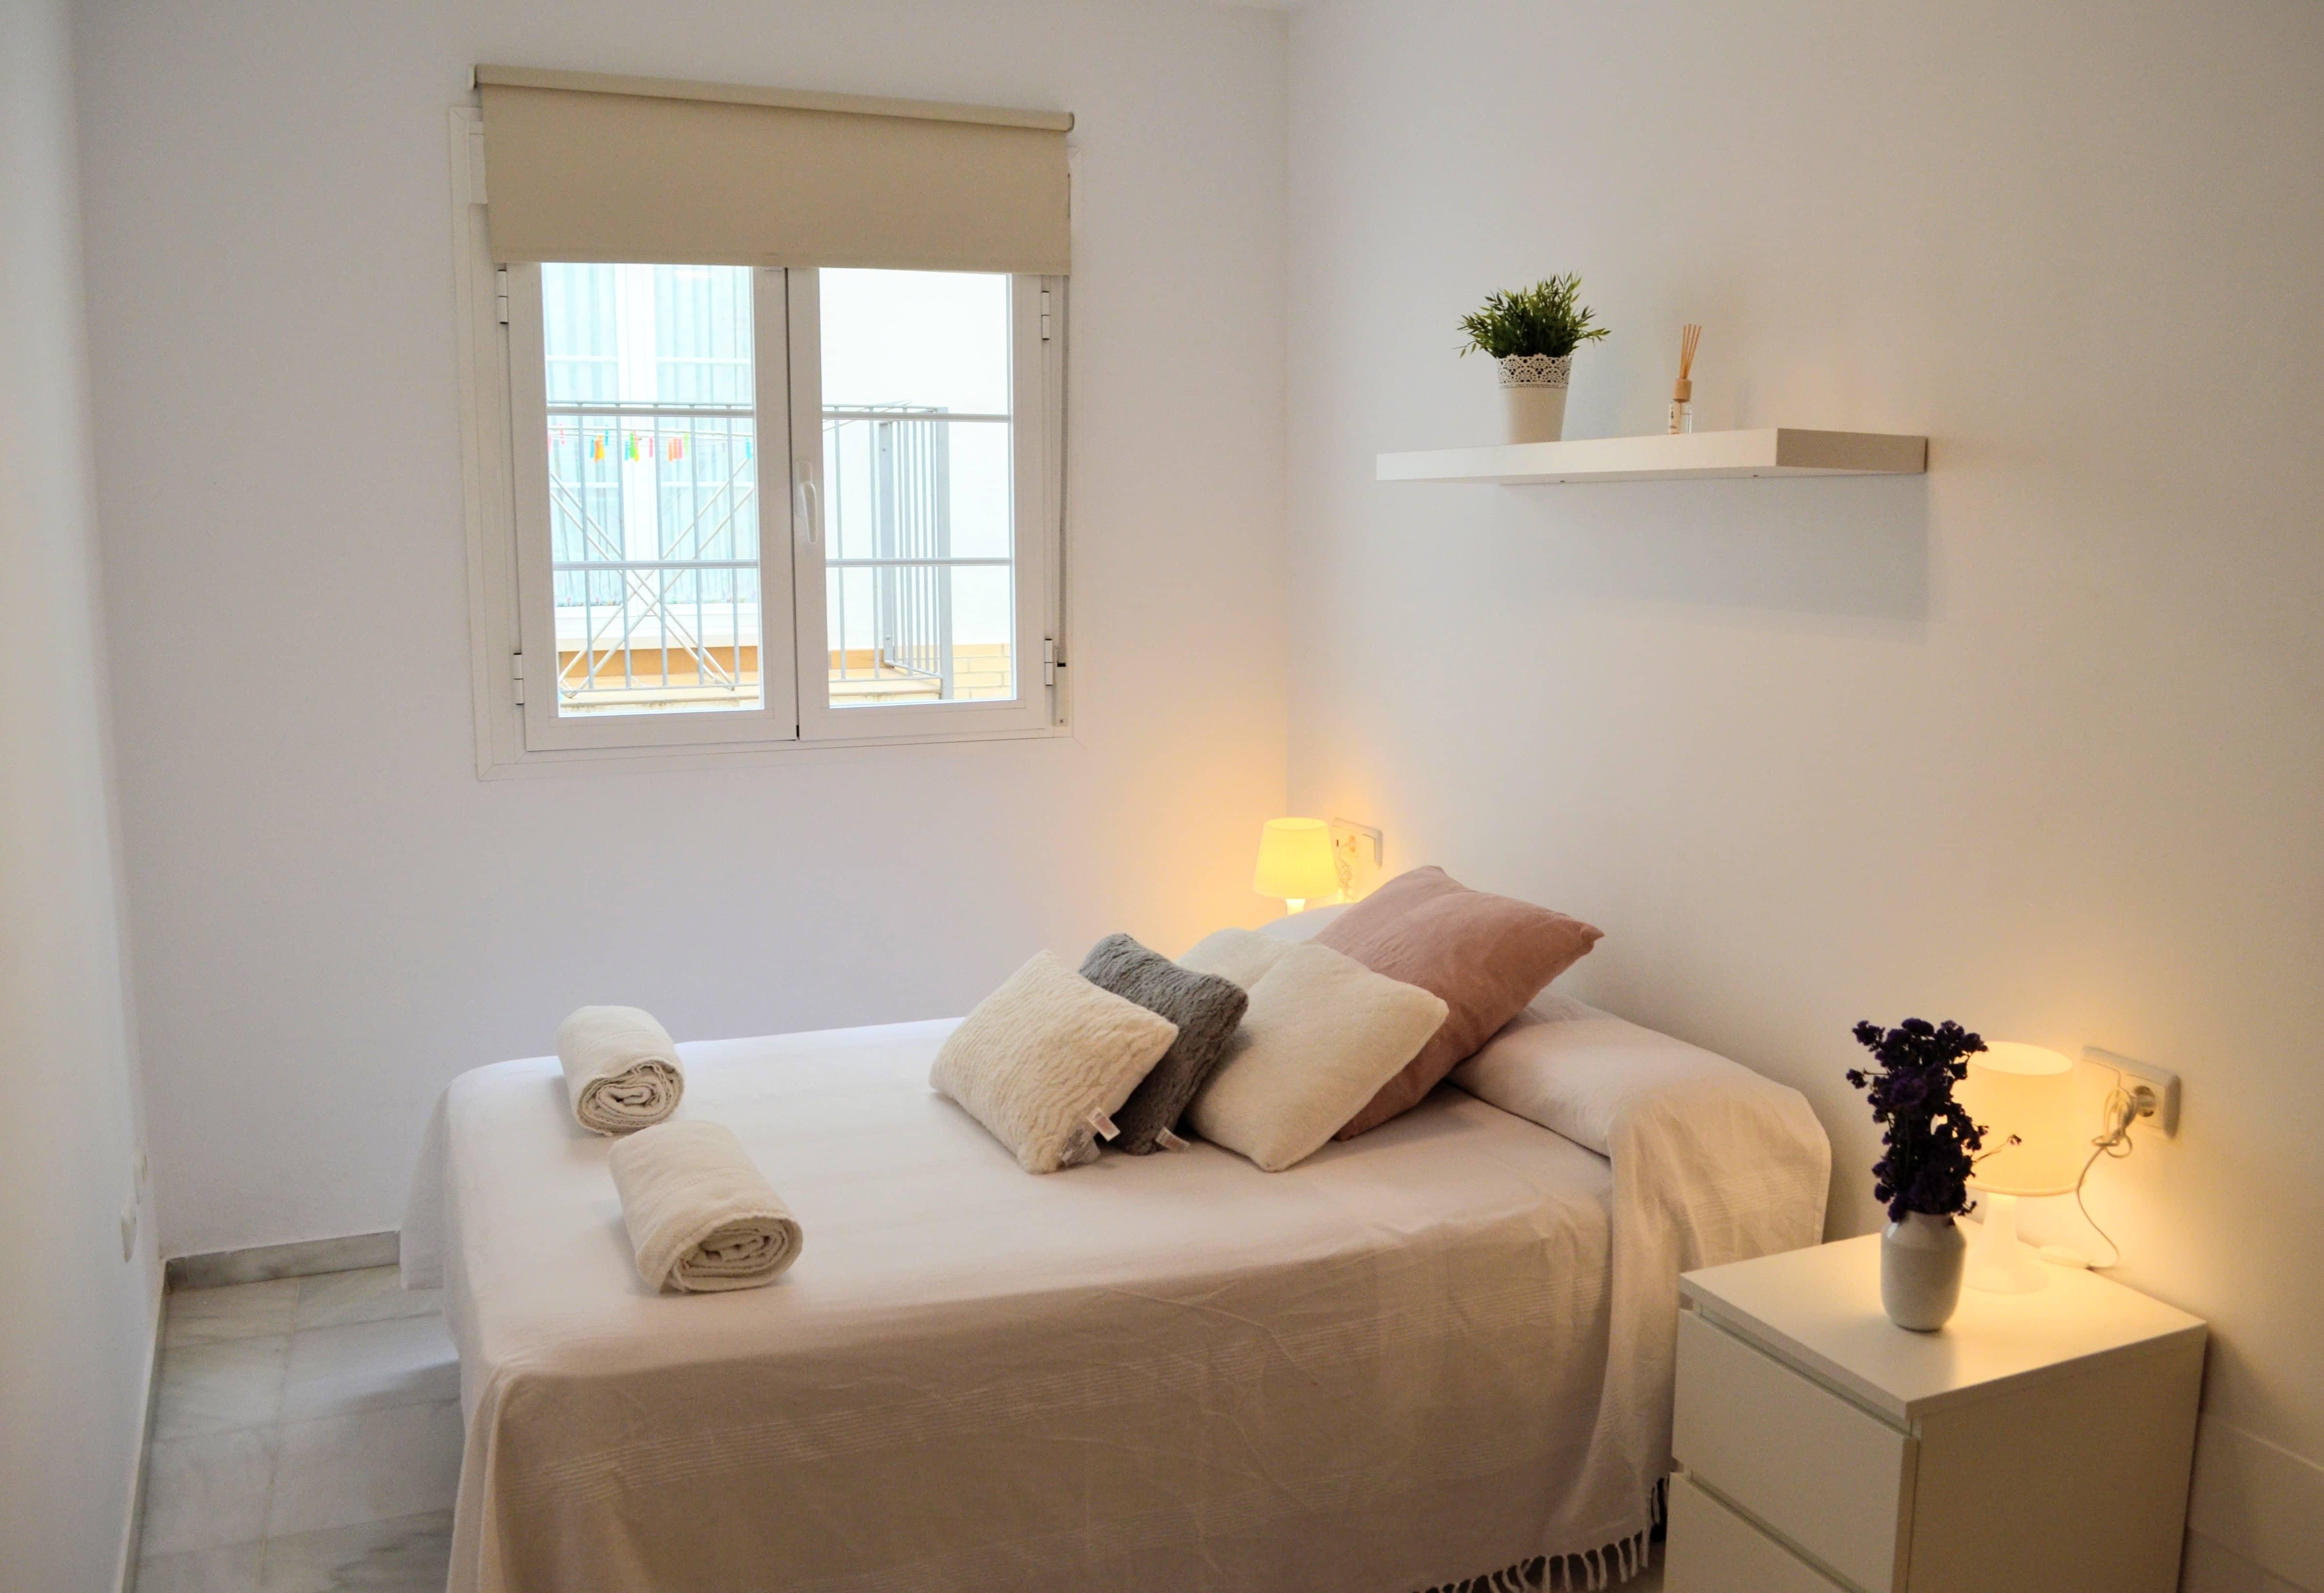 Balneario con dormitorio y terraza privada  0421